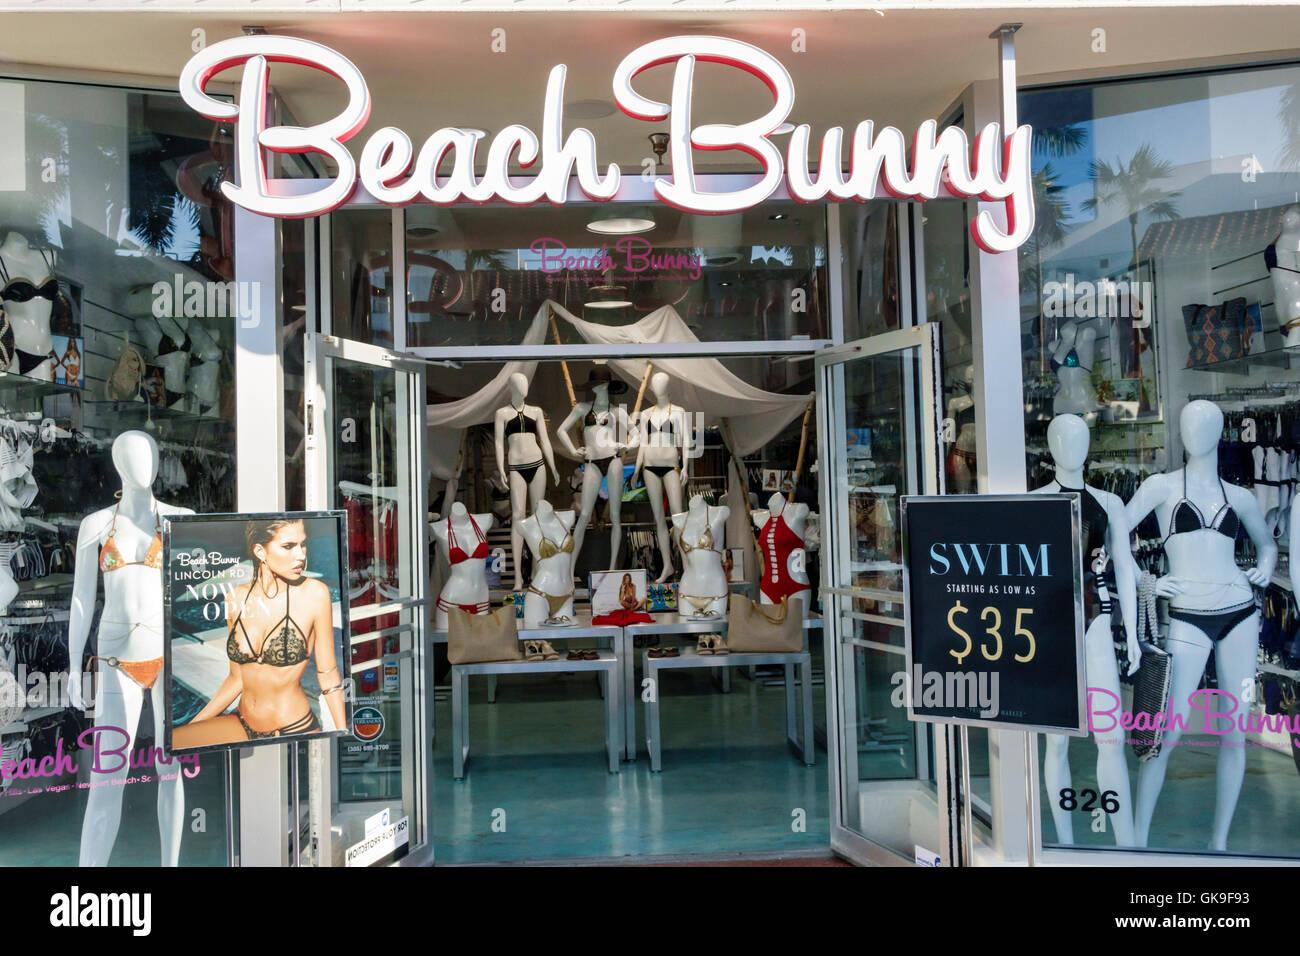 Seaside stores clothing